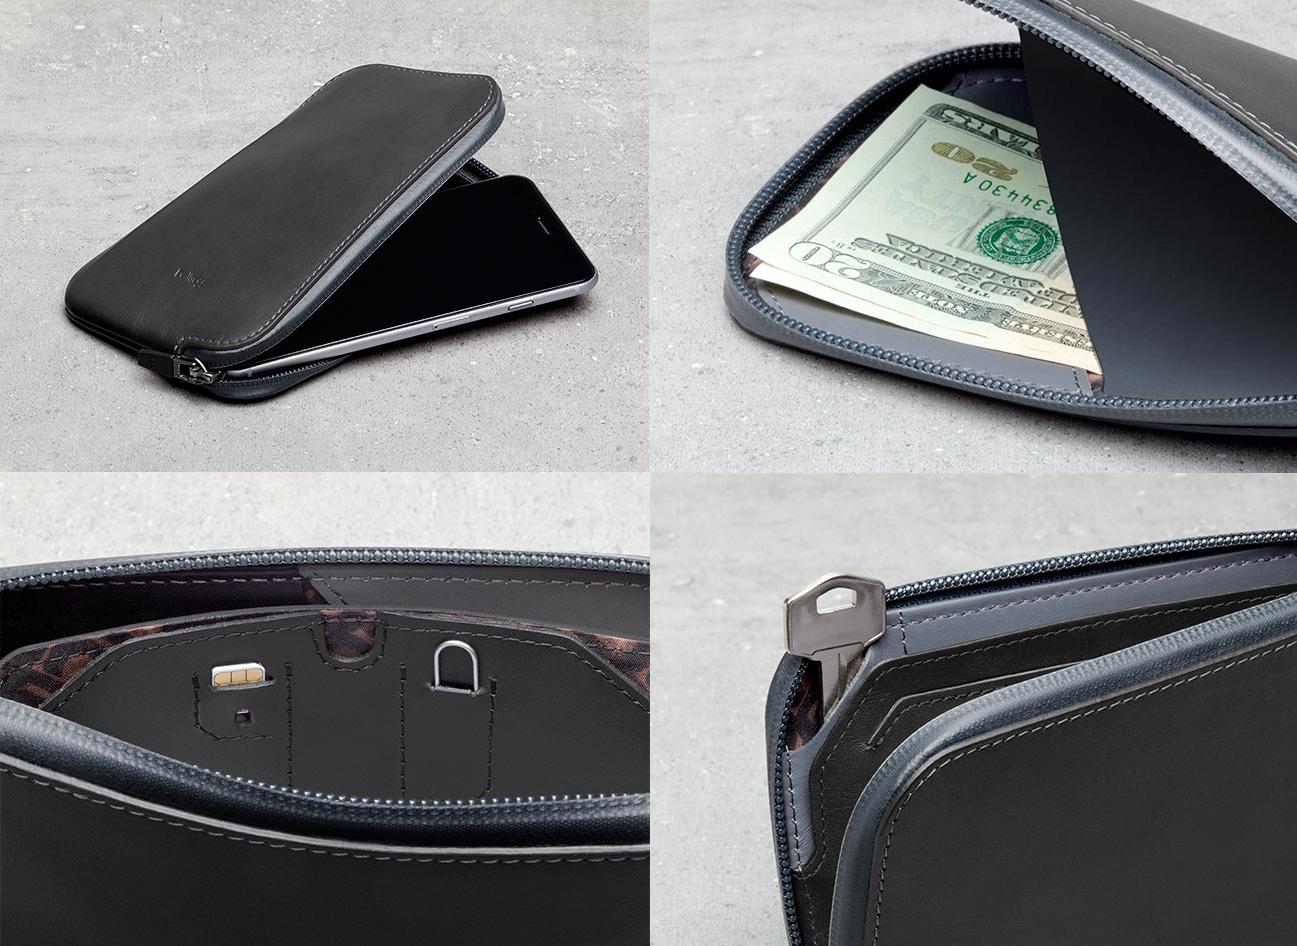 e07c57bb9d Bellroy Elements Phone Pocket Plus - Review | Discerning Cyclist